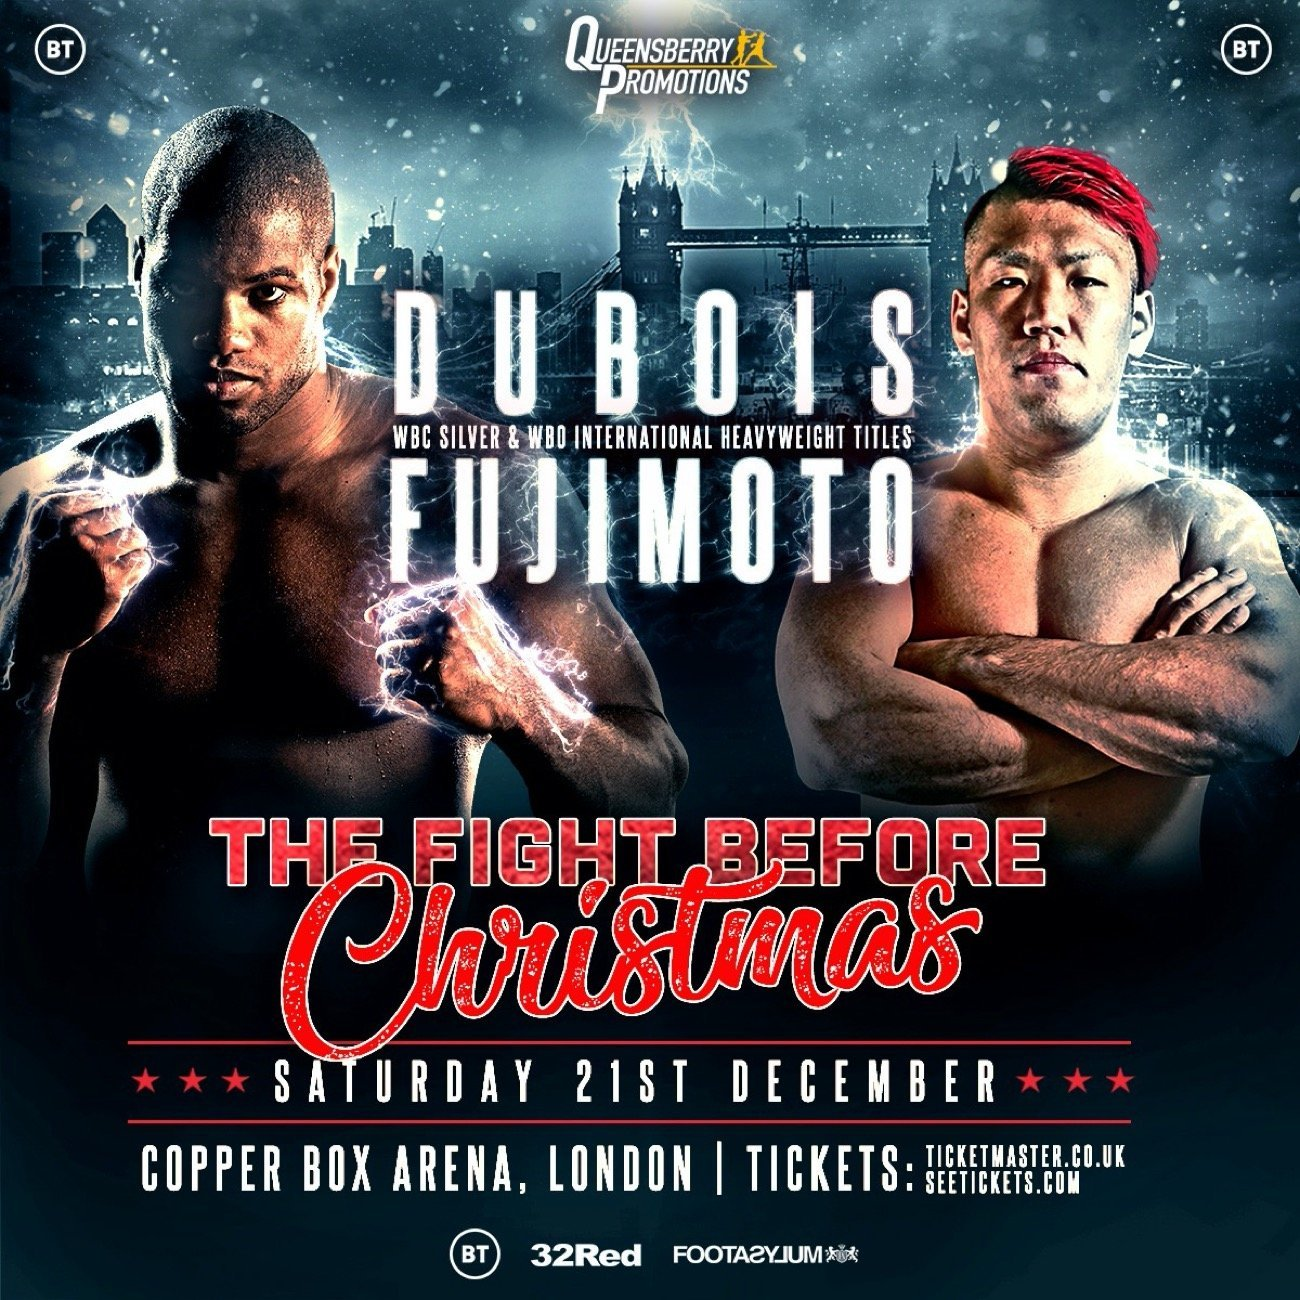 Dubois  vs Fujimoto  - BT Sport, ESPN+ @ Copper Box Arena | England | United Kingdom